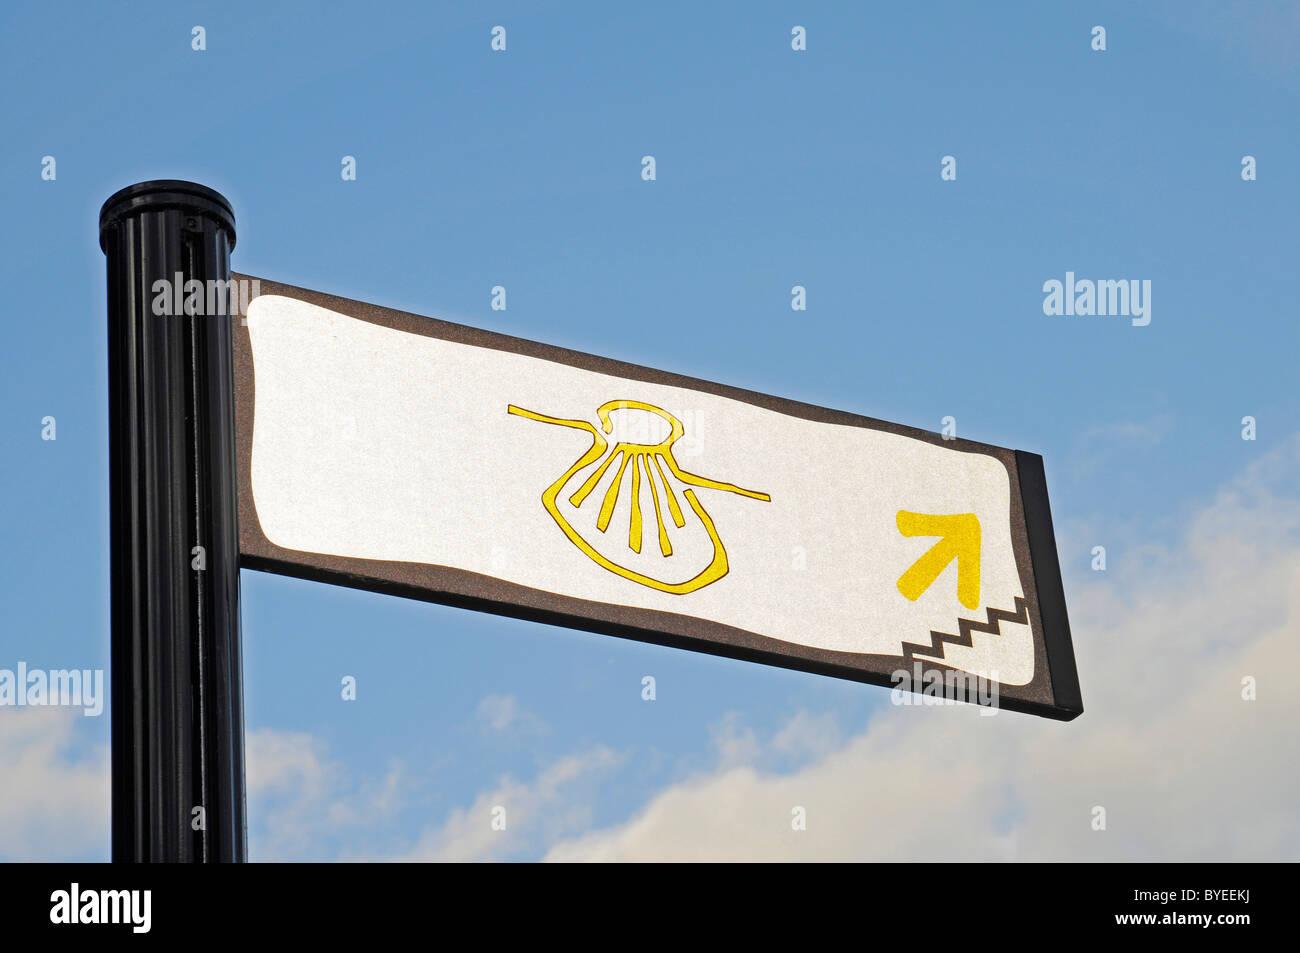 Pilgrim sign, scallop, sign on the Way of St. James, Logrono, La Rioja, Spain, Europe - Stock Image